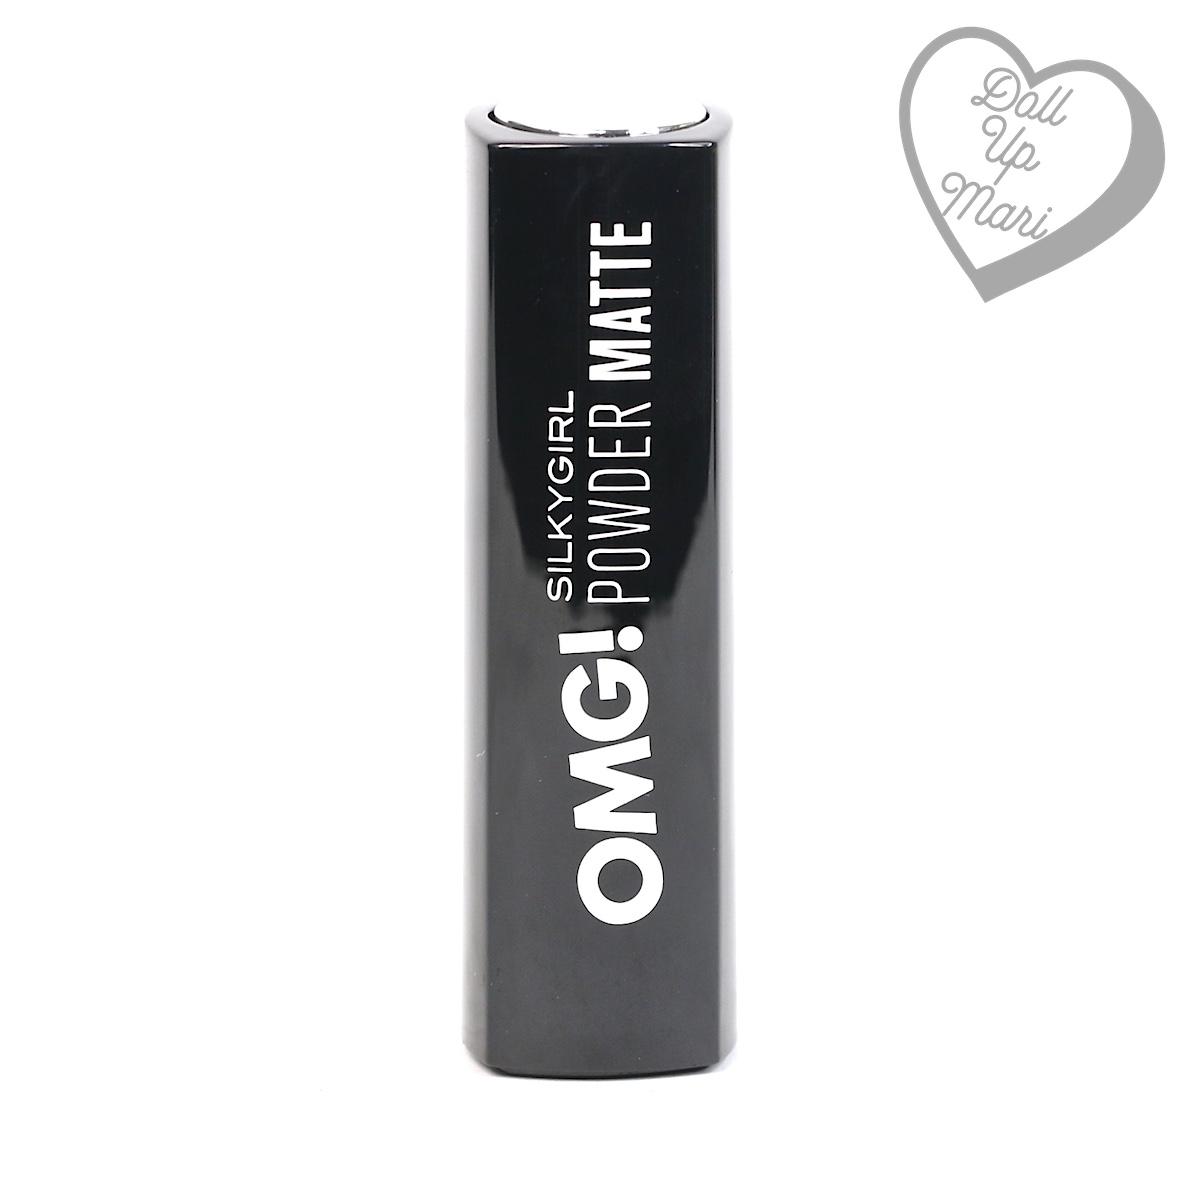 Casing of Silkygirl OMG! Powder Matte Lipcolor Lipstick